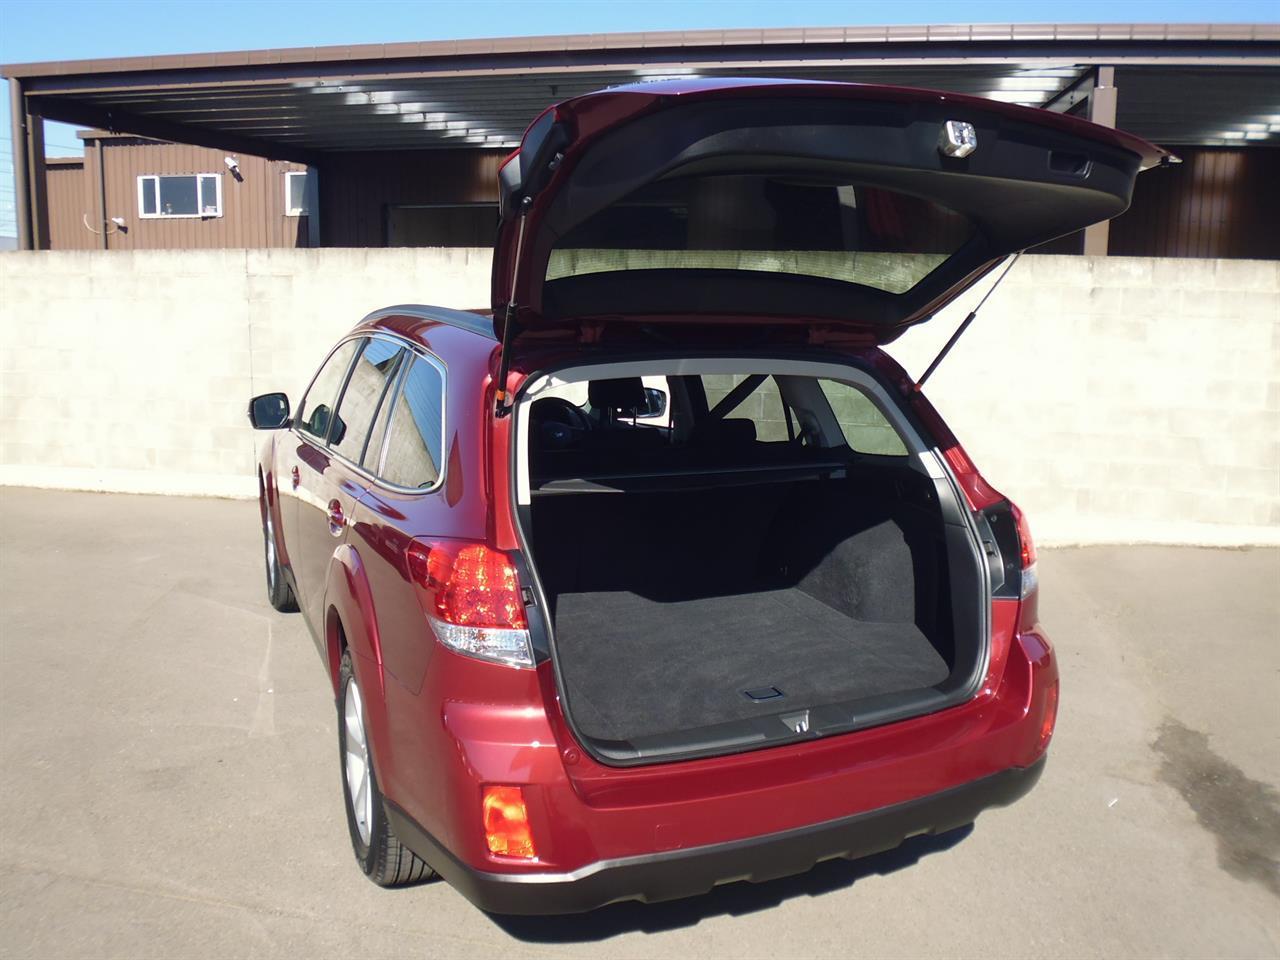 image-4, 2012 Subaru Outback 2.5i Eyesight at Christchurch